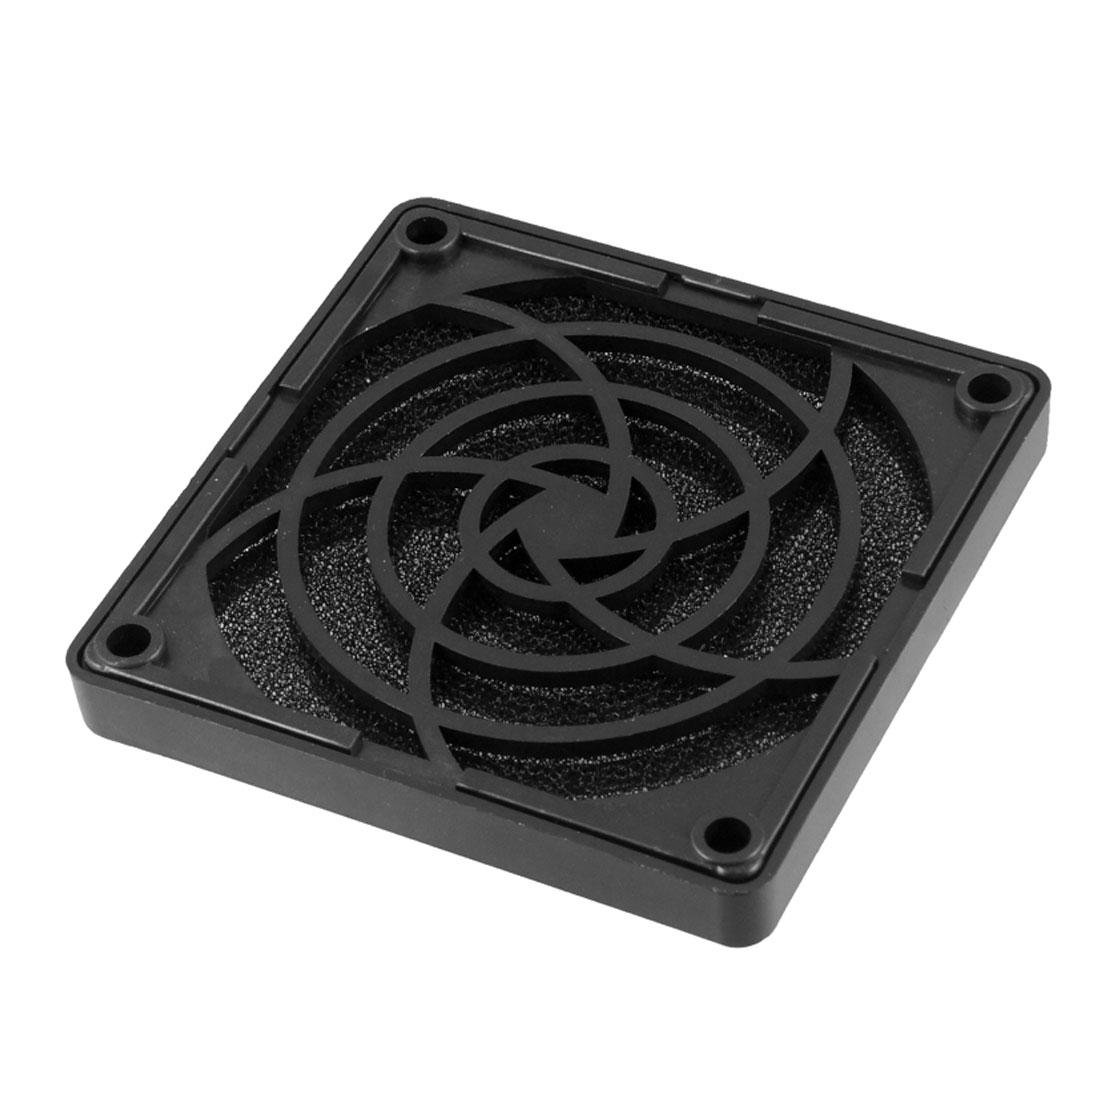 Black Plastic Square Dustproof Filter 80mm PC Case Fan Dust Guard Mesh